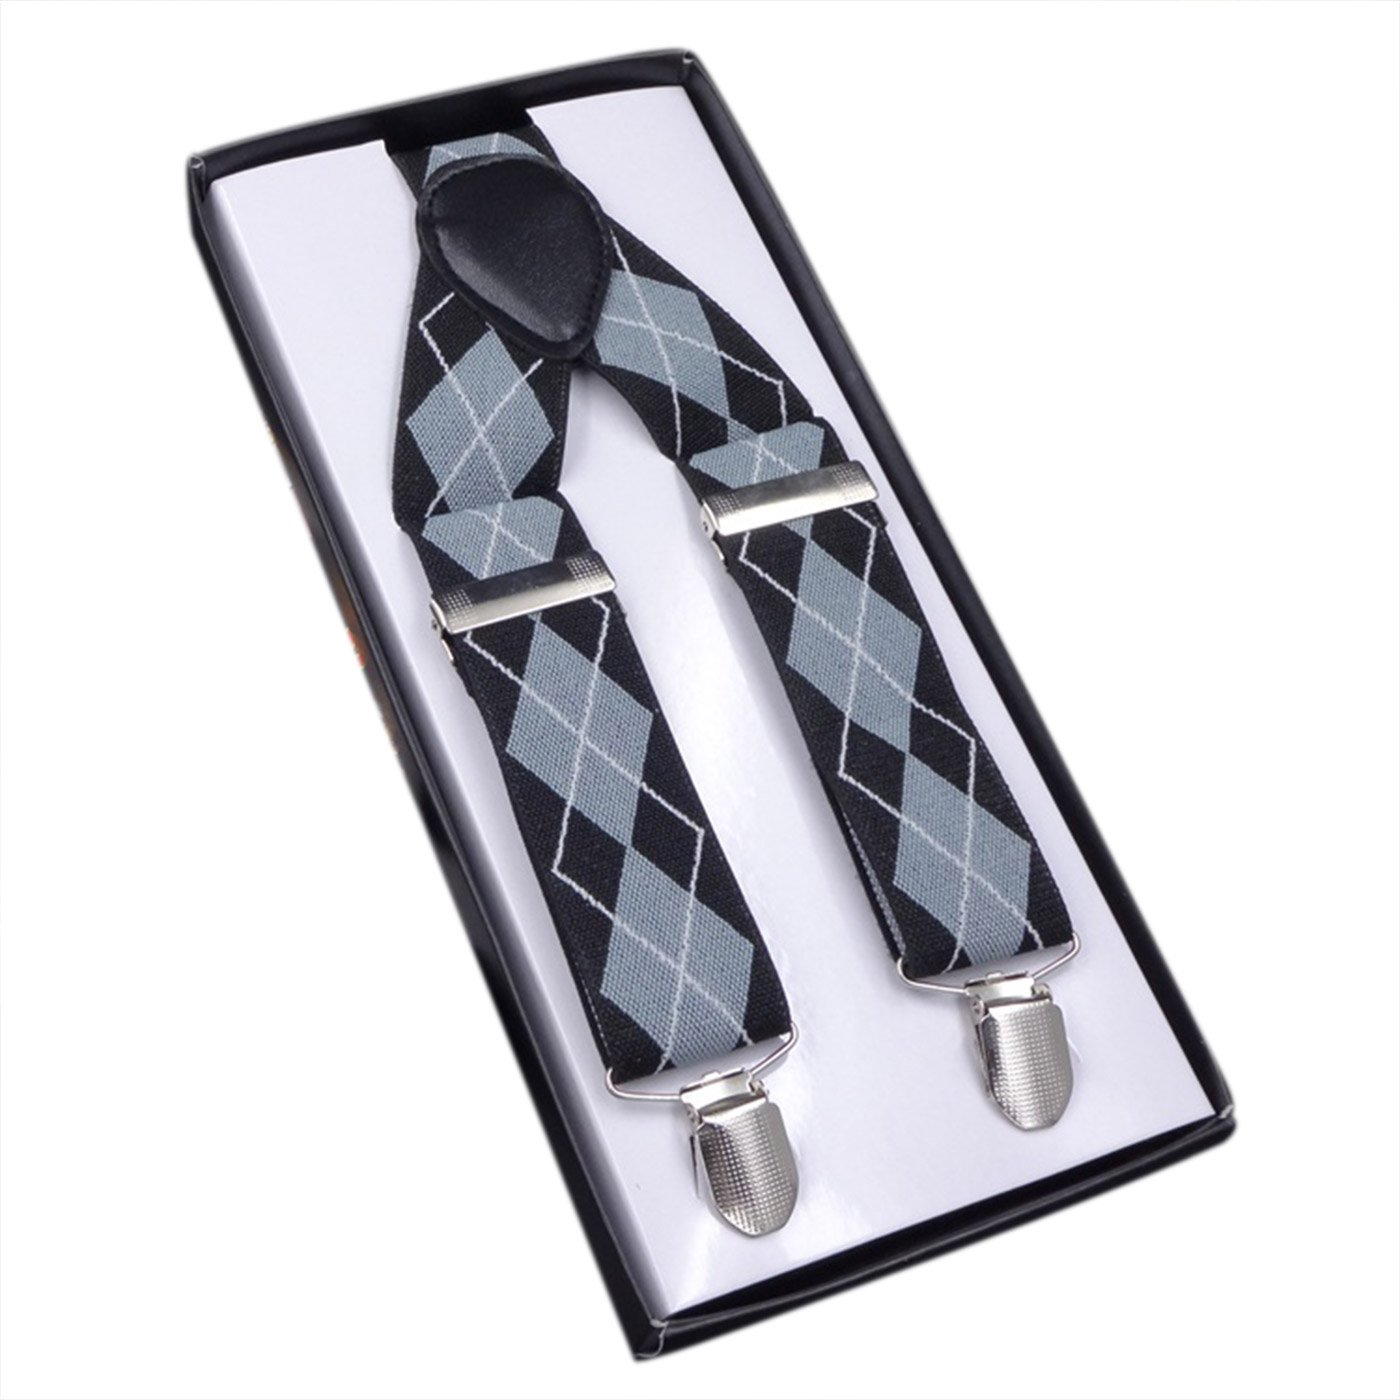 Panegy Unisex Damen Herren Hosenträger 3 Stabile Clips 3.5cm Breite Y-Form Stil Retro Knopf Männer Hosenträger mit Leder Elastisch Längenverstallbar (Farbe Wählbar)